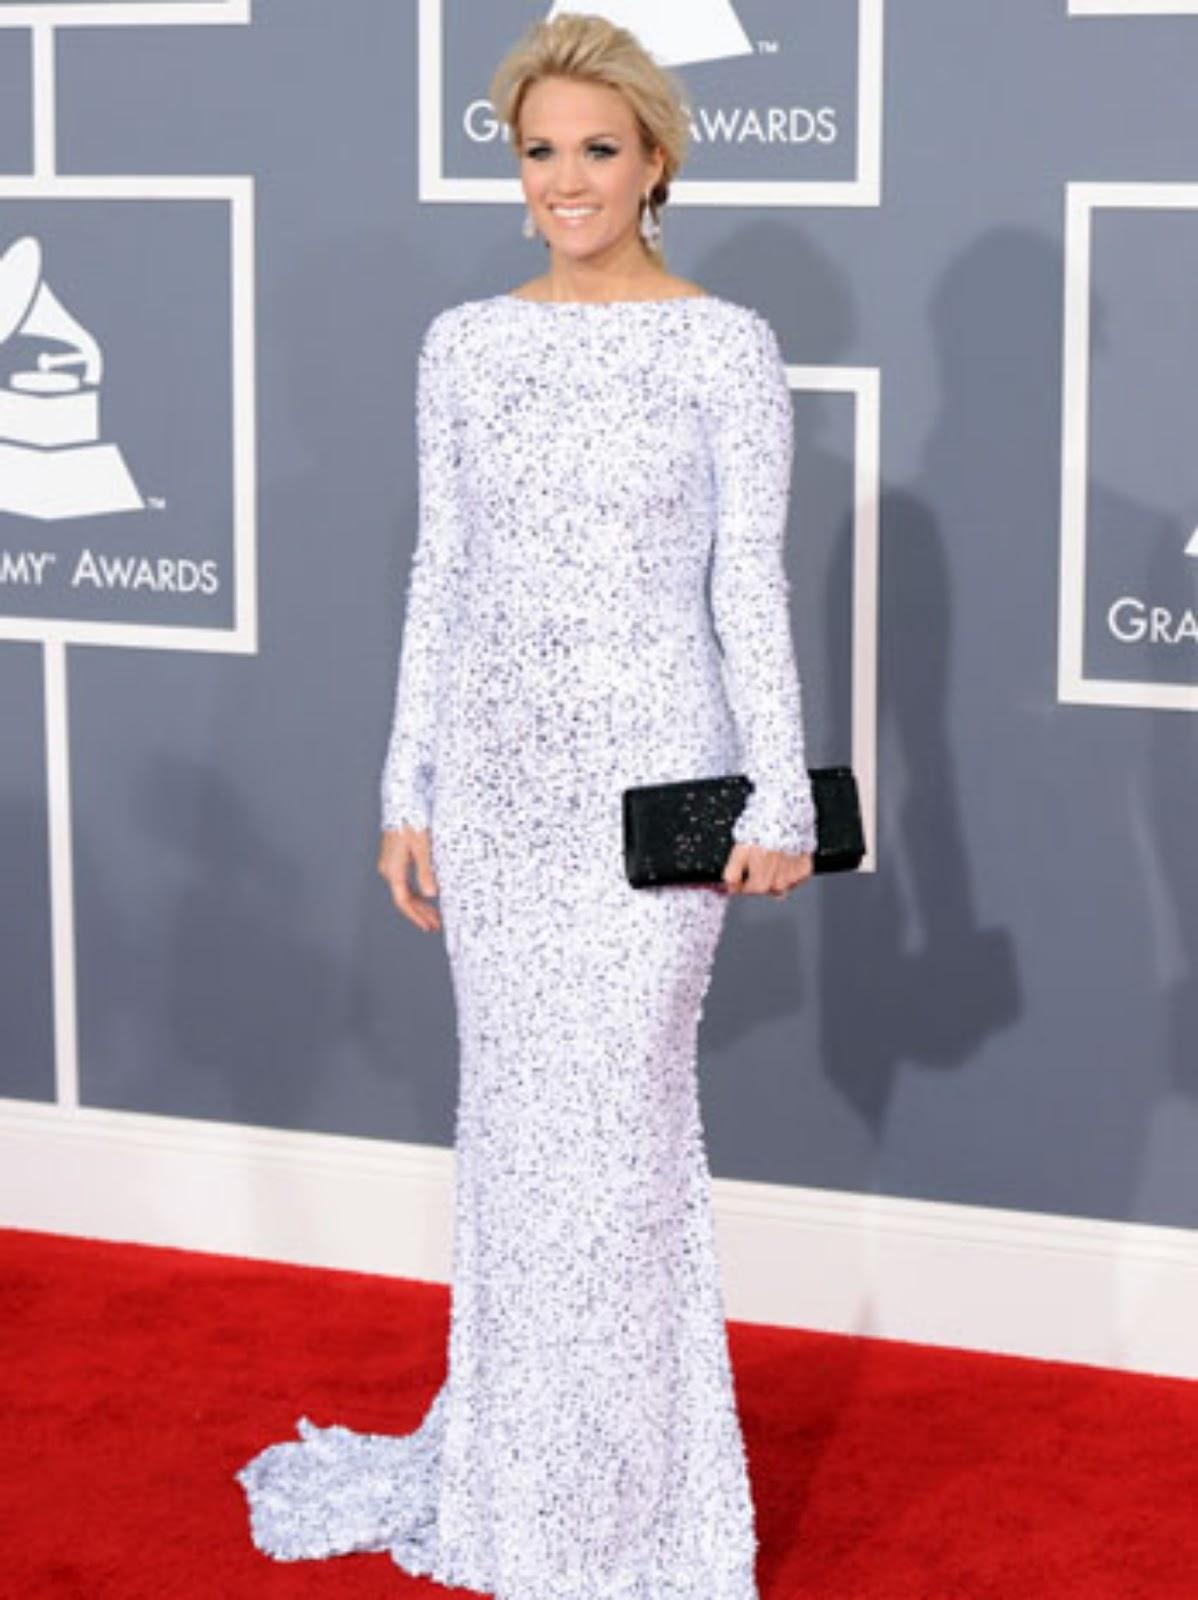 Grammy Awards 2012 Red Carpet Arrivals Fashion News